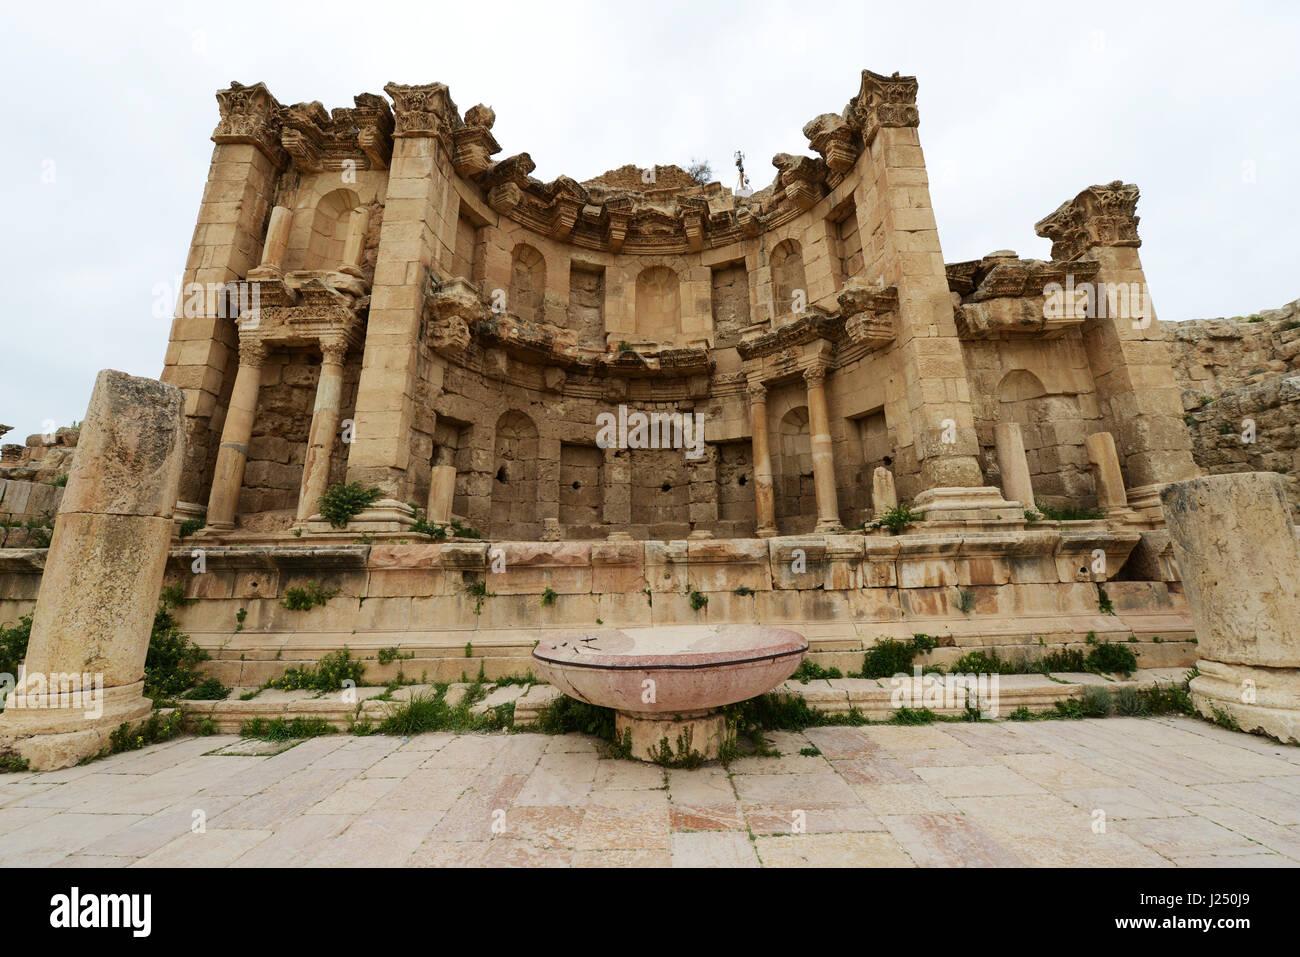 The Nymphaeum  ancient Roman city of Jerash in Jordan. - Stock Image